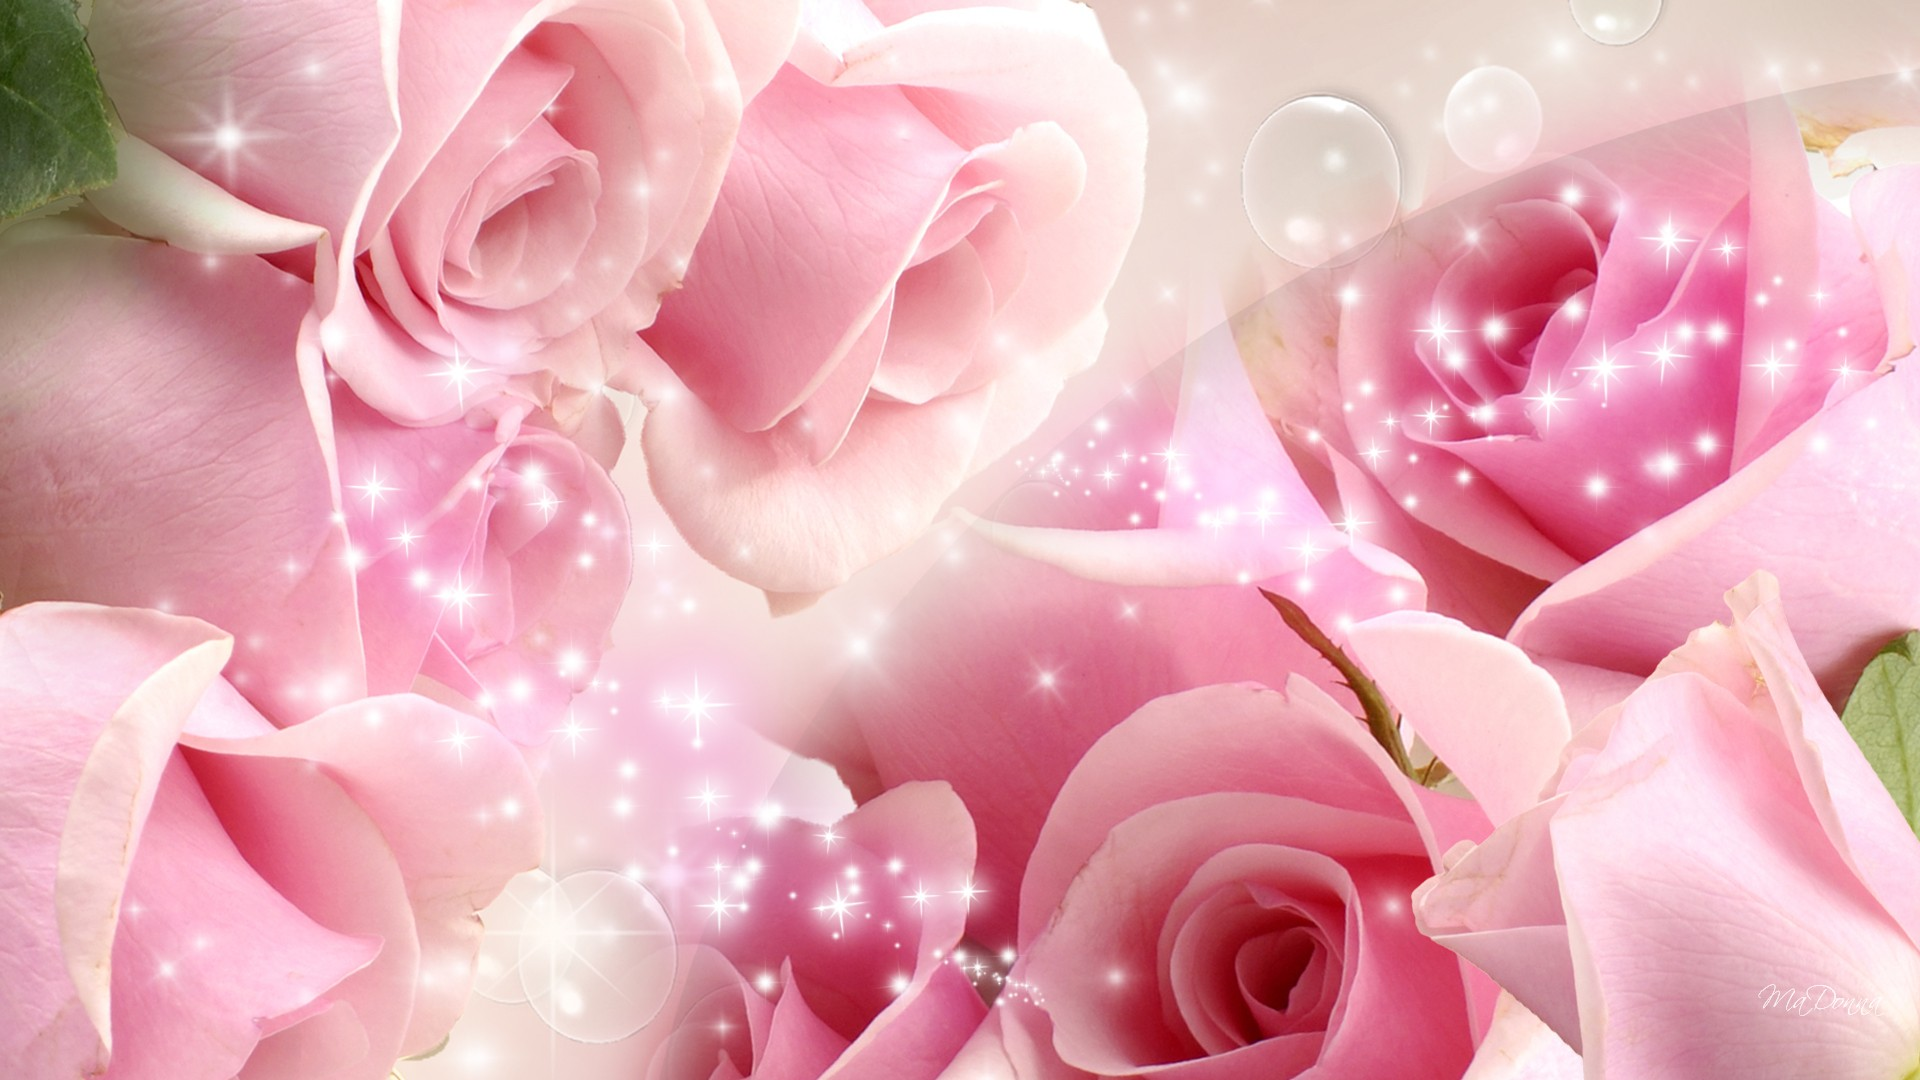 93 Black Pink Rosé Wallpapers On Wallpapersafari